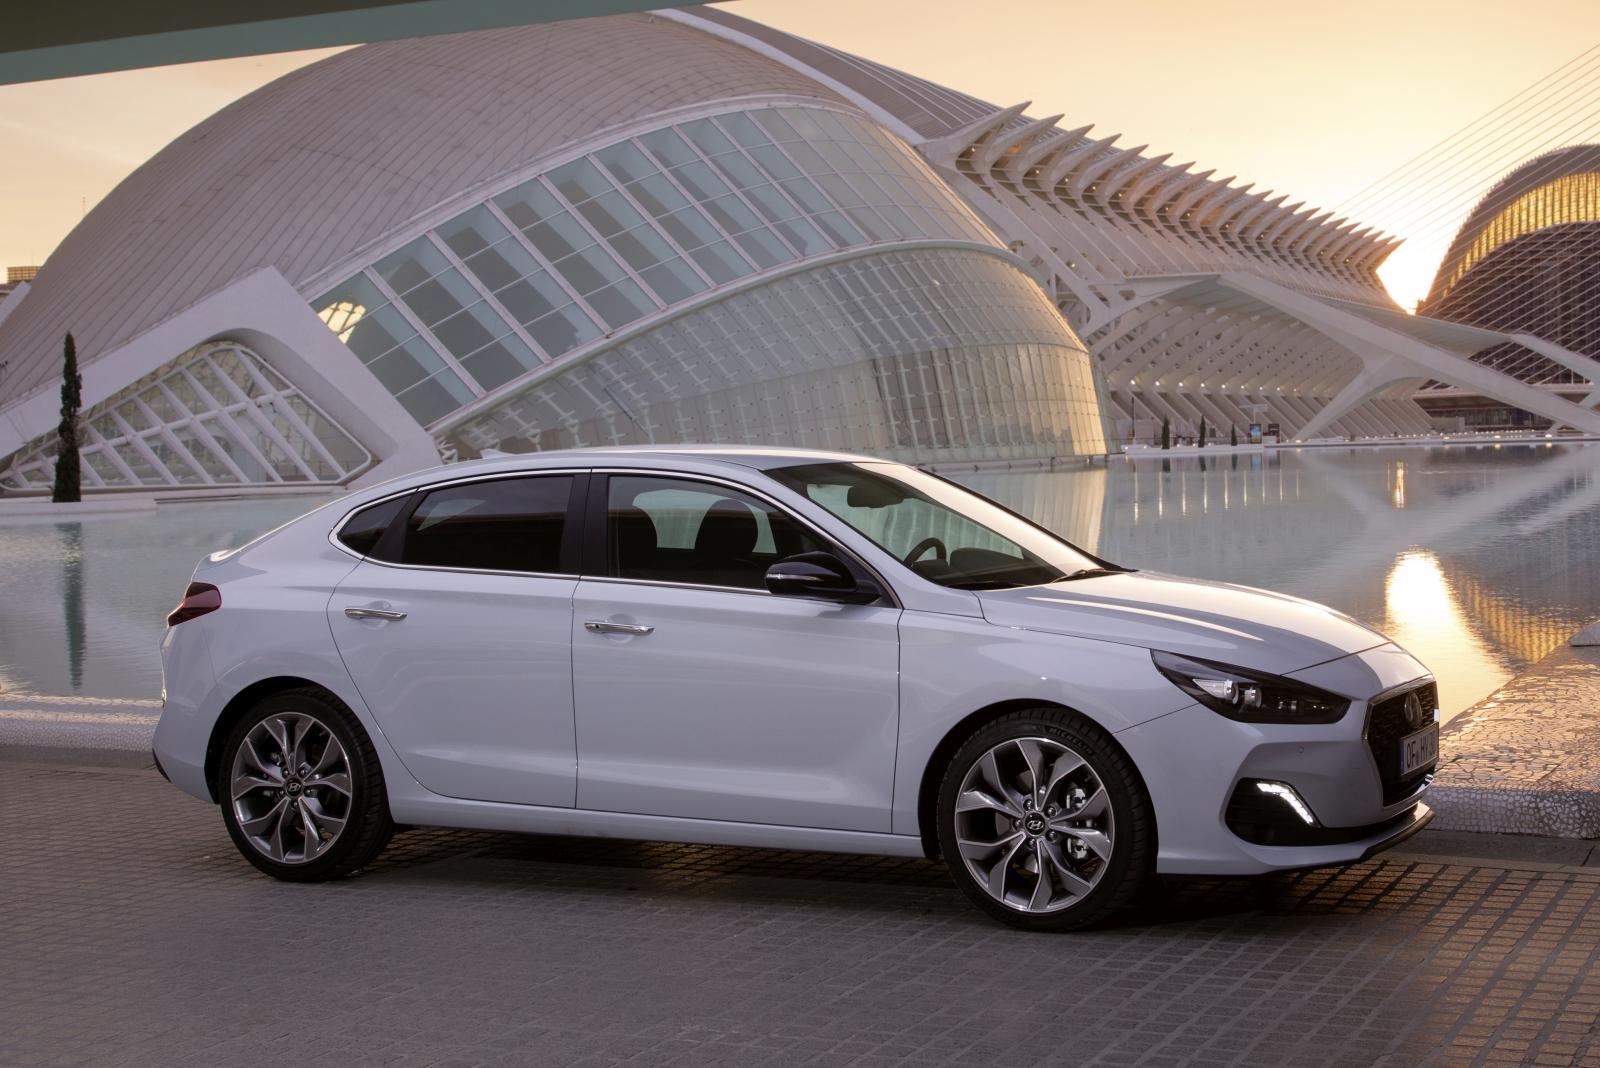 hyundai-all-new-i30-fastback-2018-exterior-19-hires